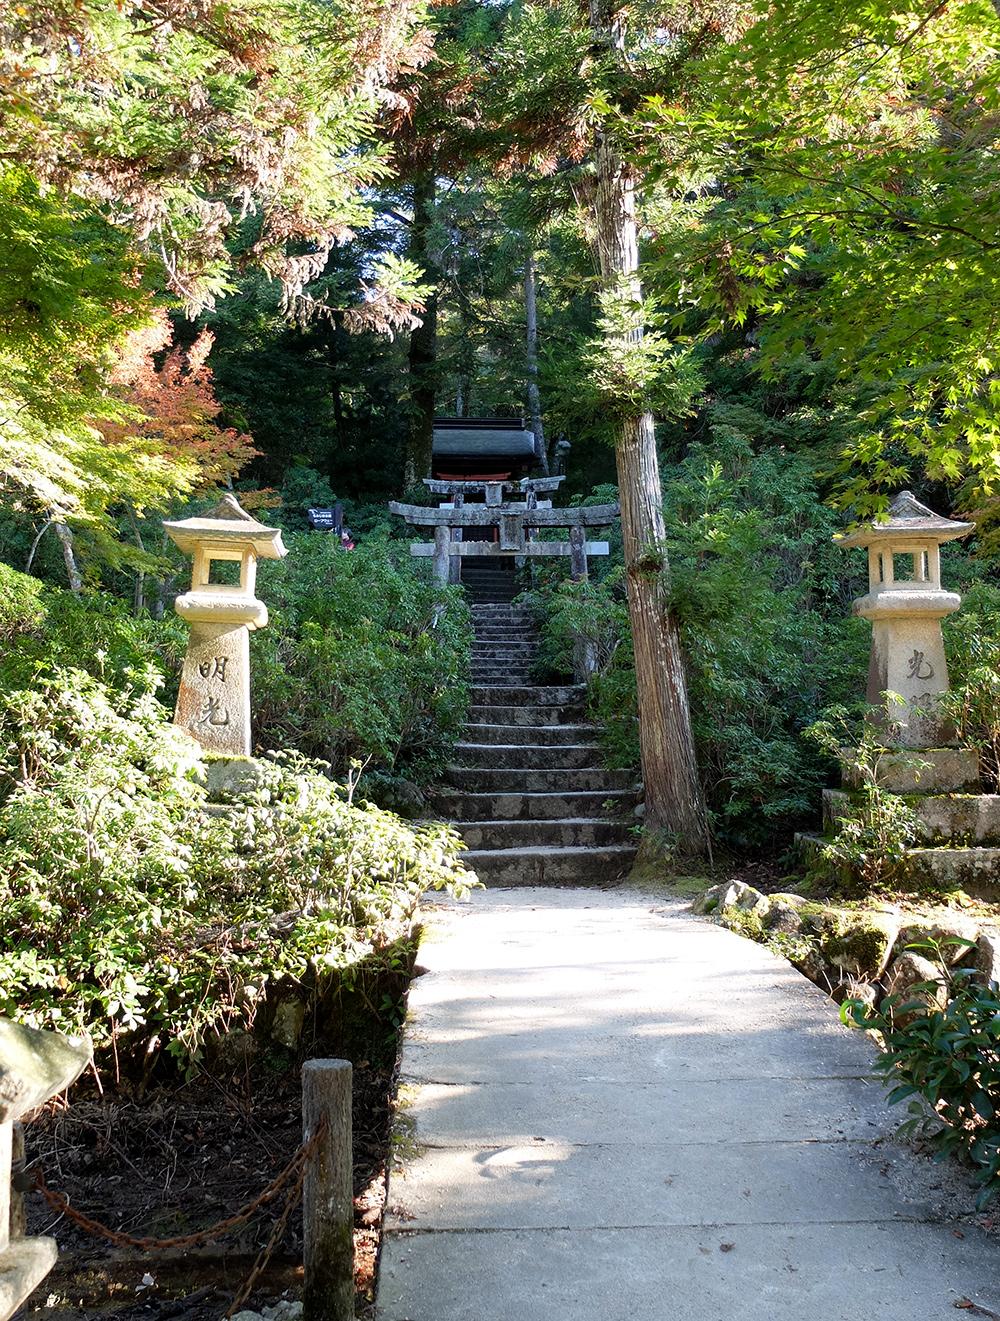 Le sanctuaire Shinomiya 四宮神社, Miyajima, Parc Momijidani